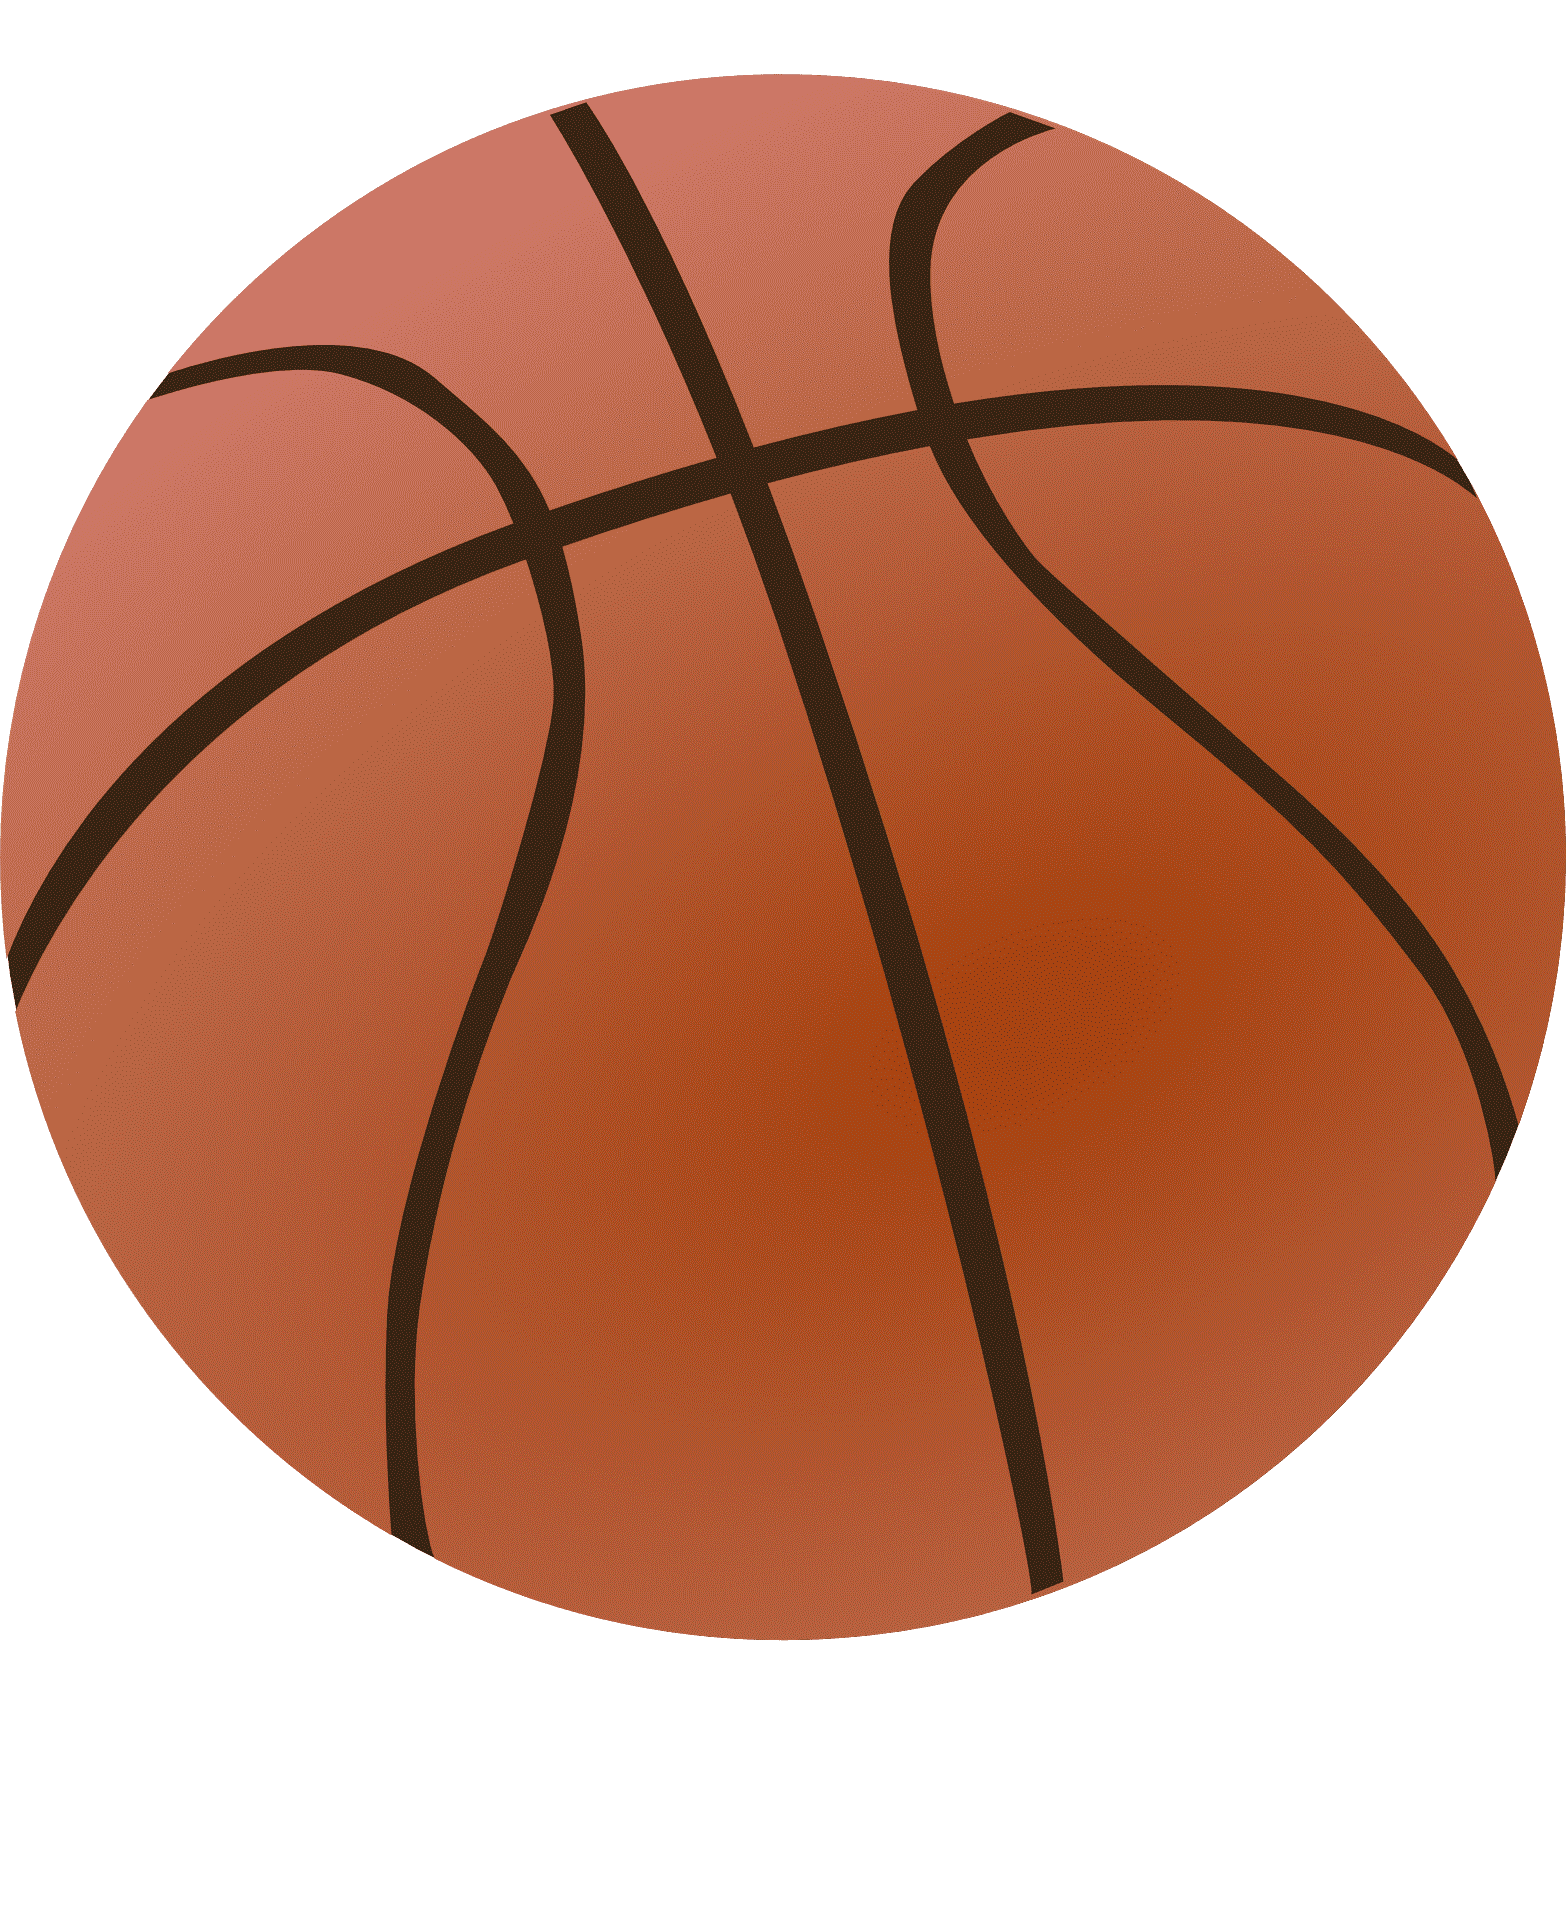 ball, sports, basketball